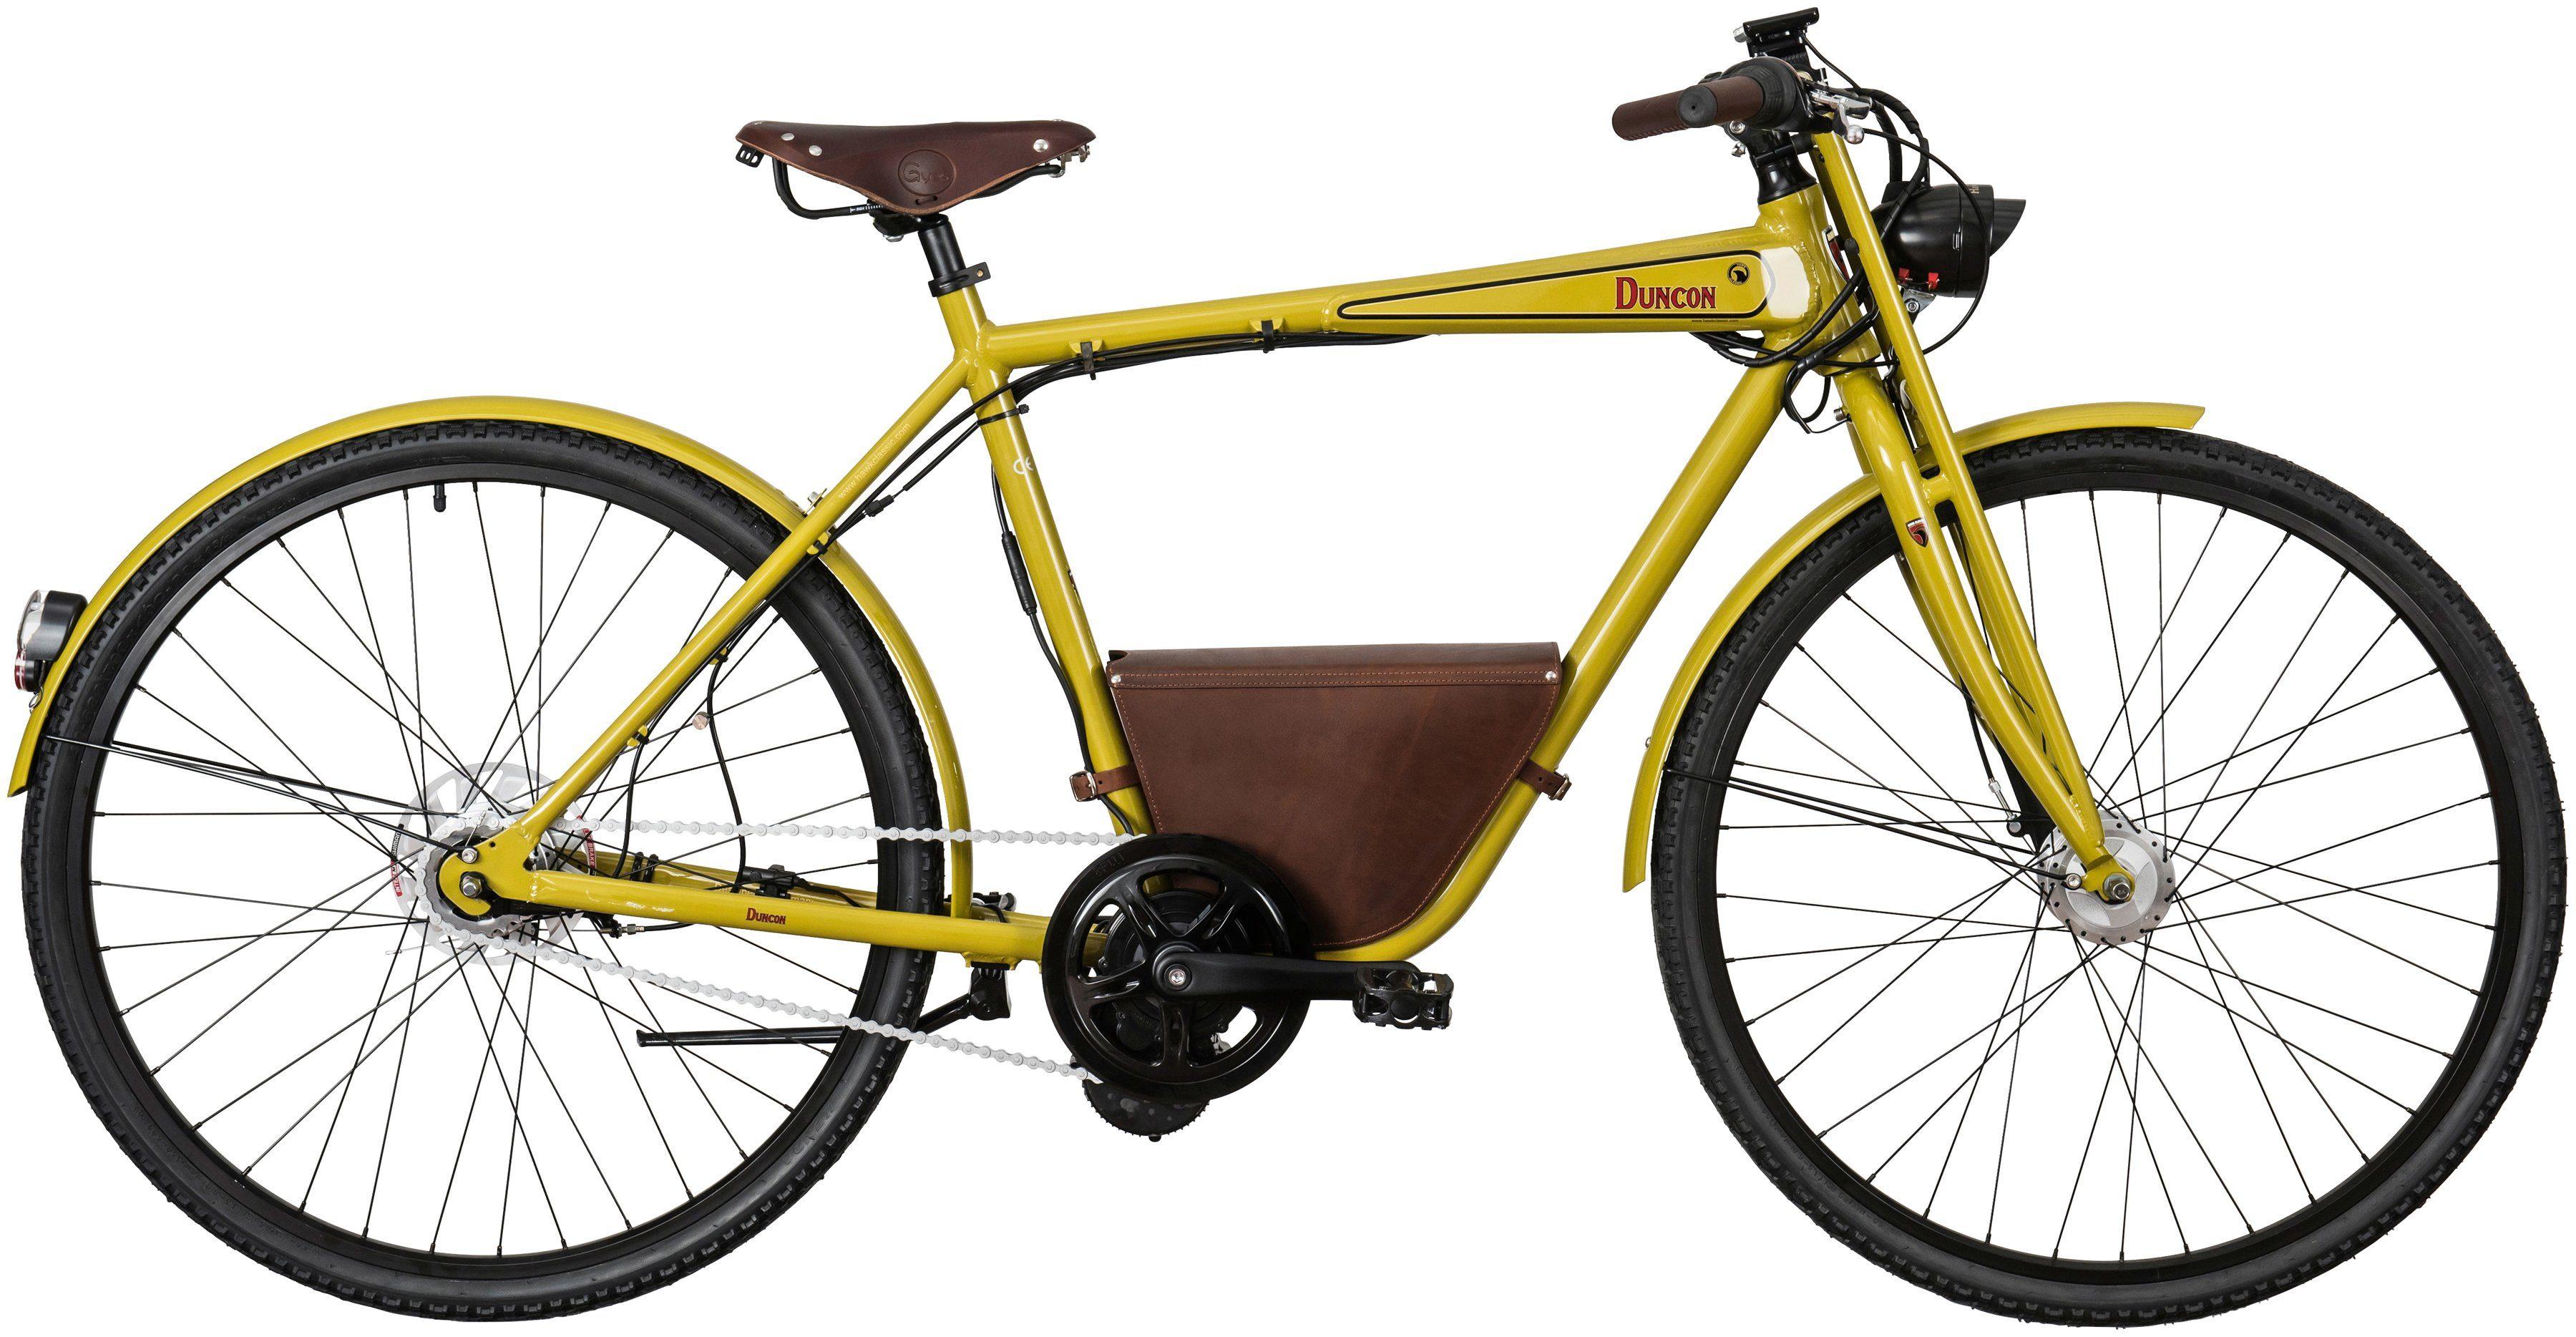 Hawk E-Bike City Herren »Duncon«, 28 Zoll, 7 Gang, Mittelmotor, 241 Wh